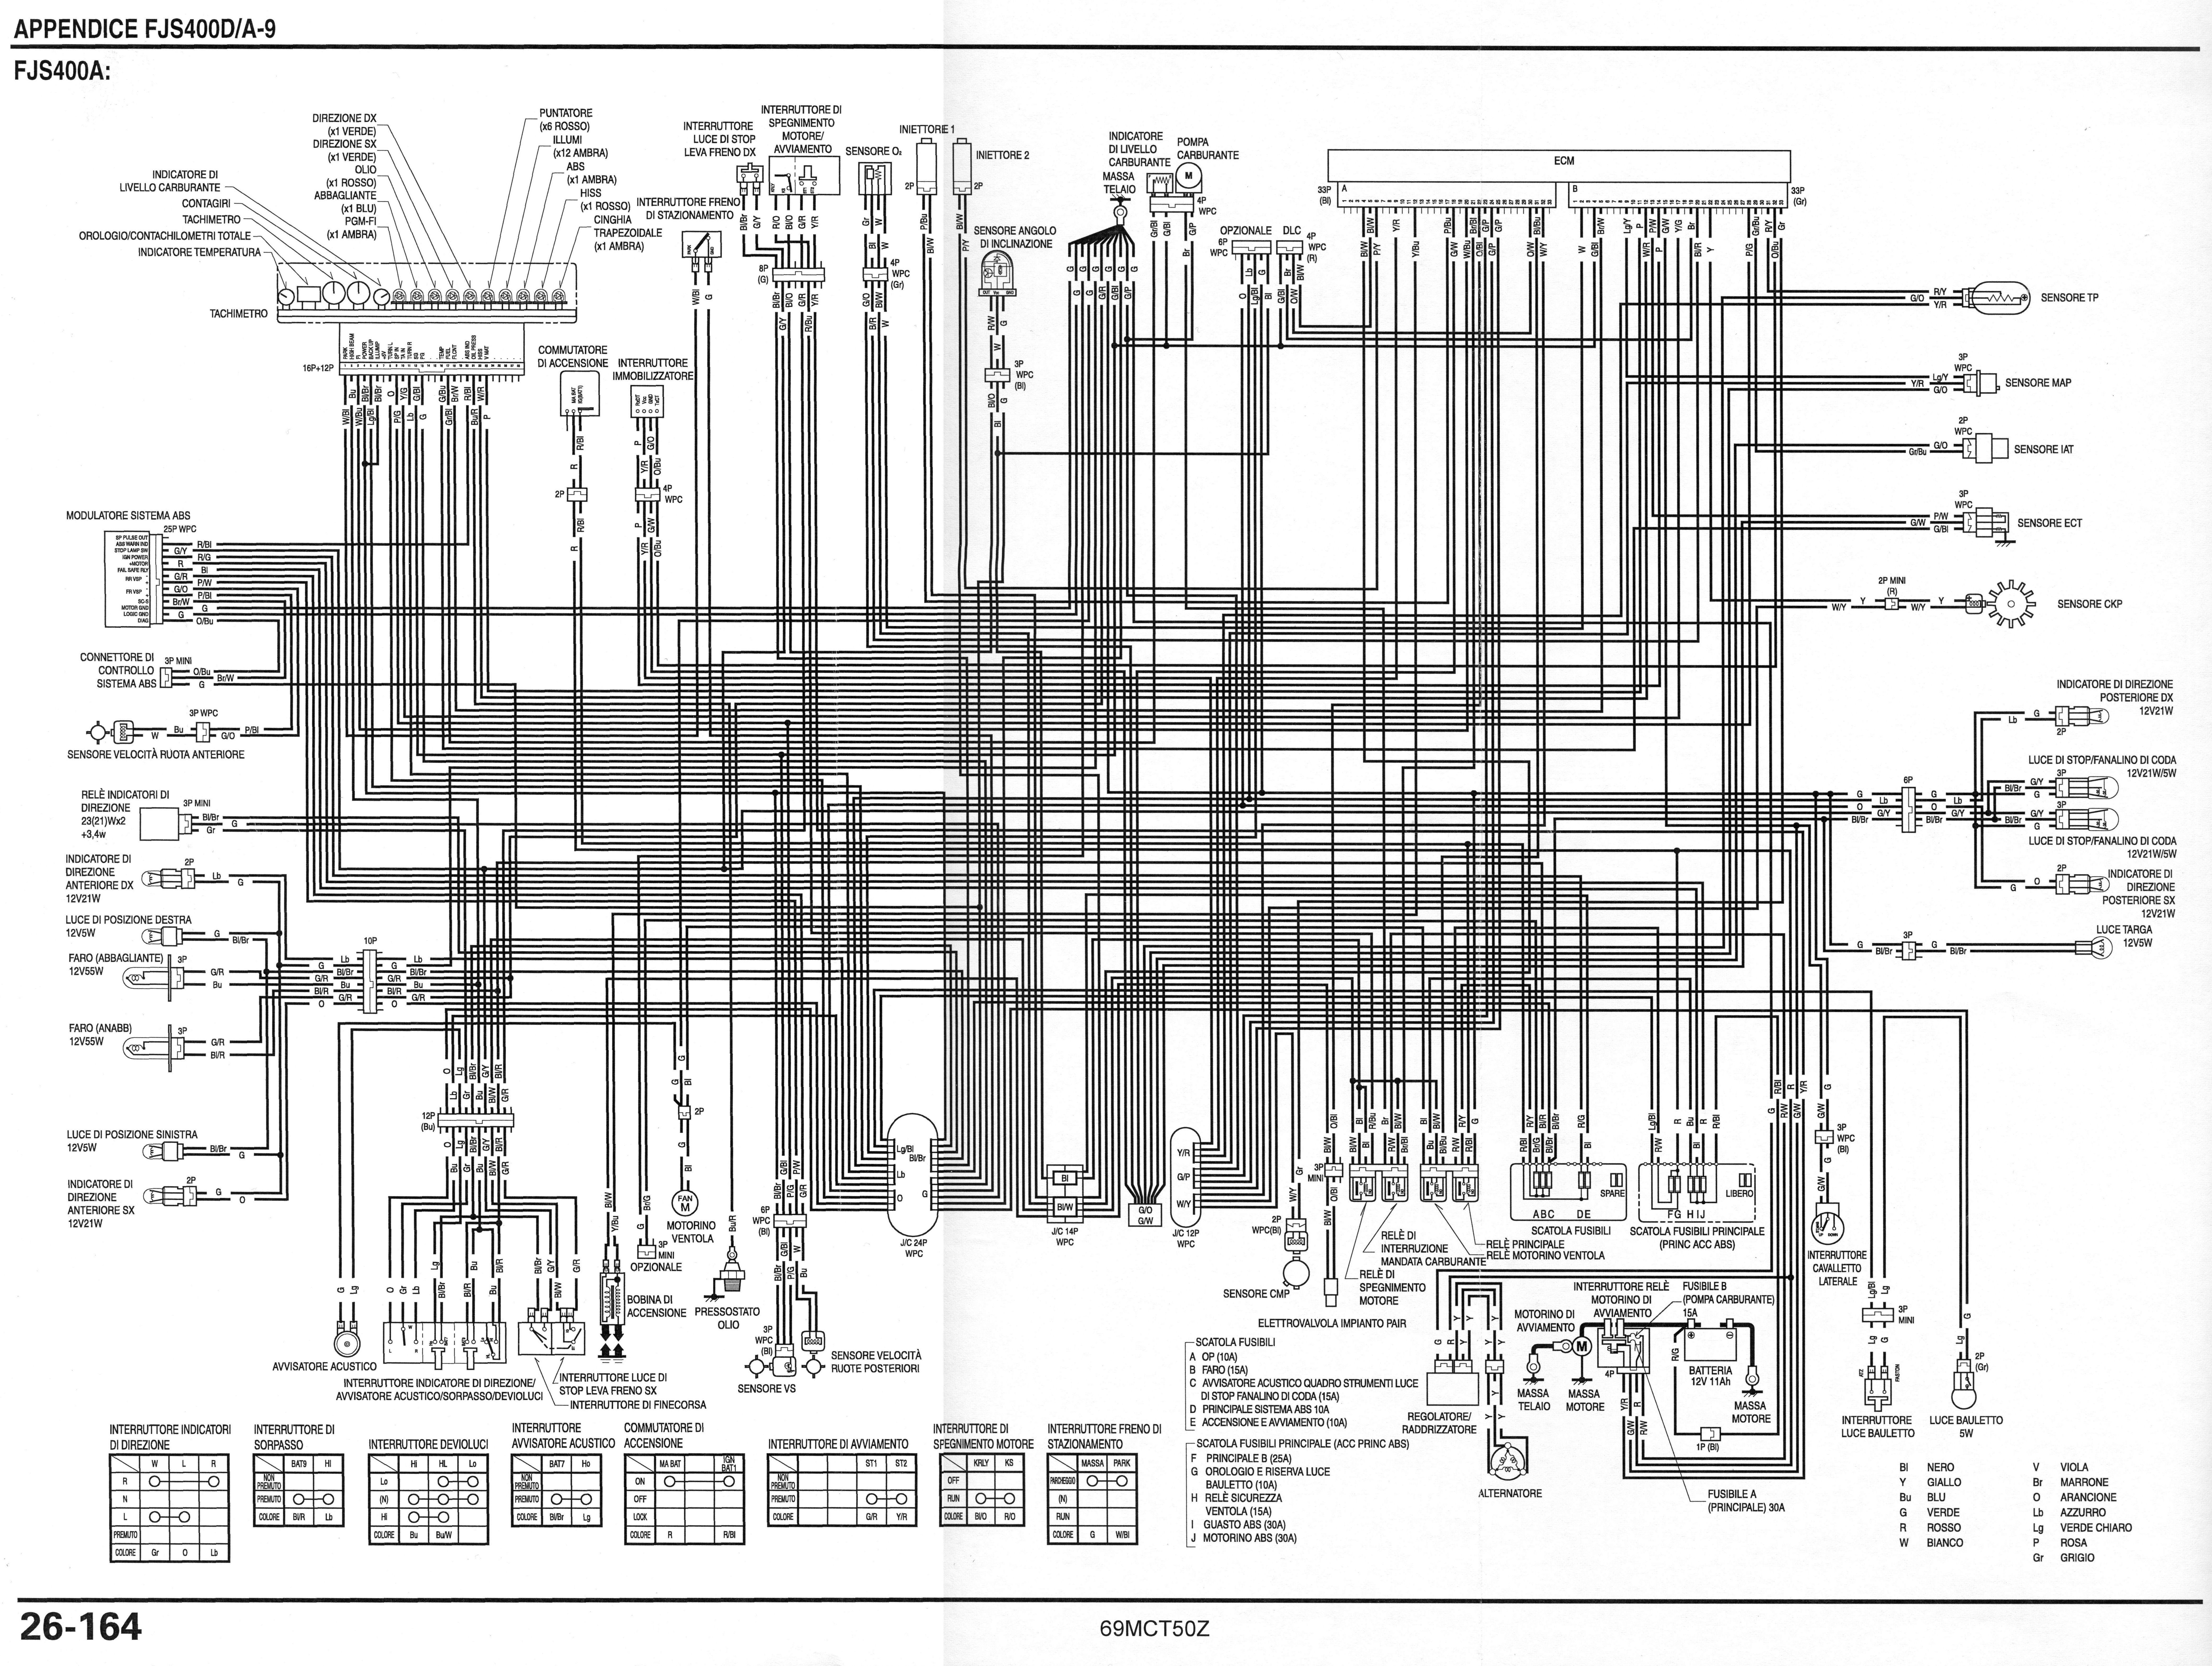 Schemi Elettrici Nissan : Schema elettrico sw t